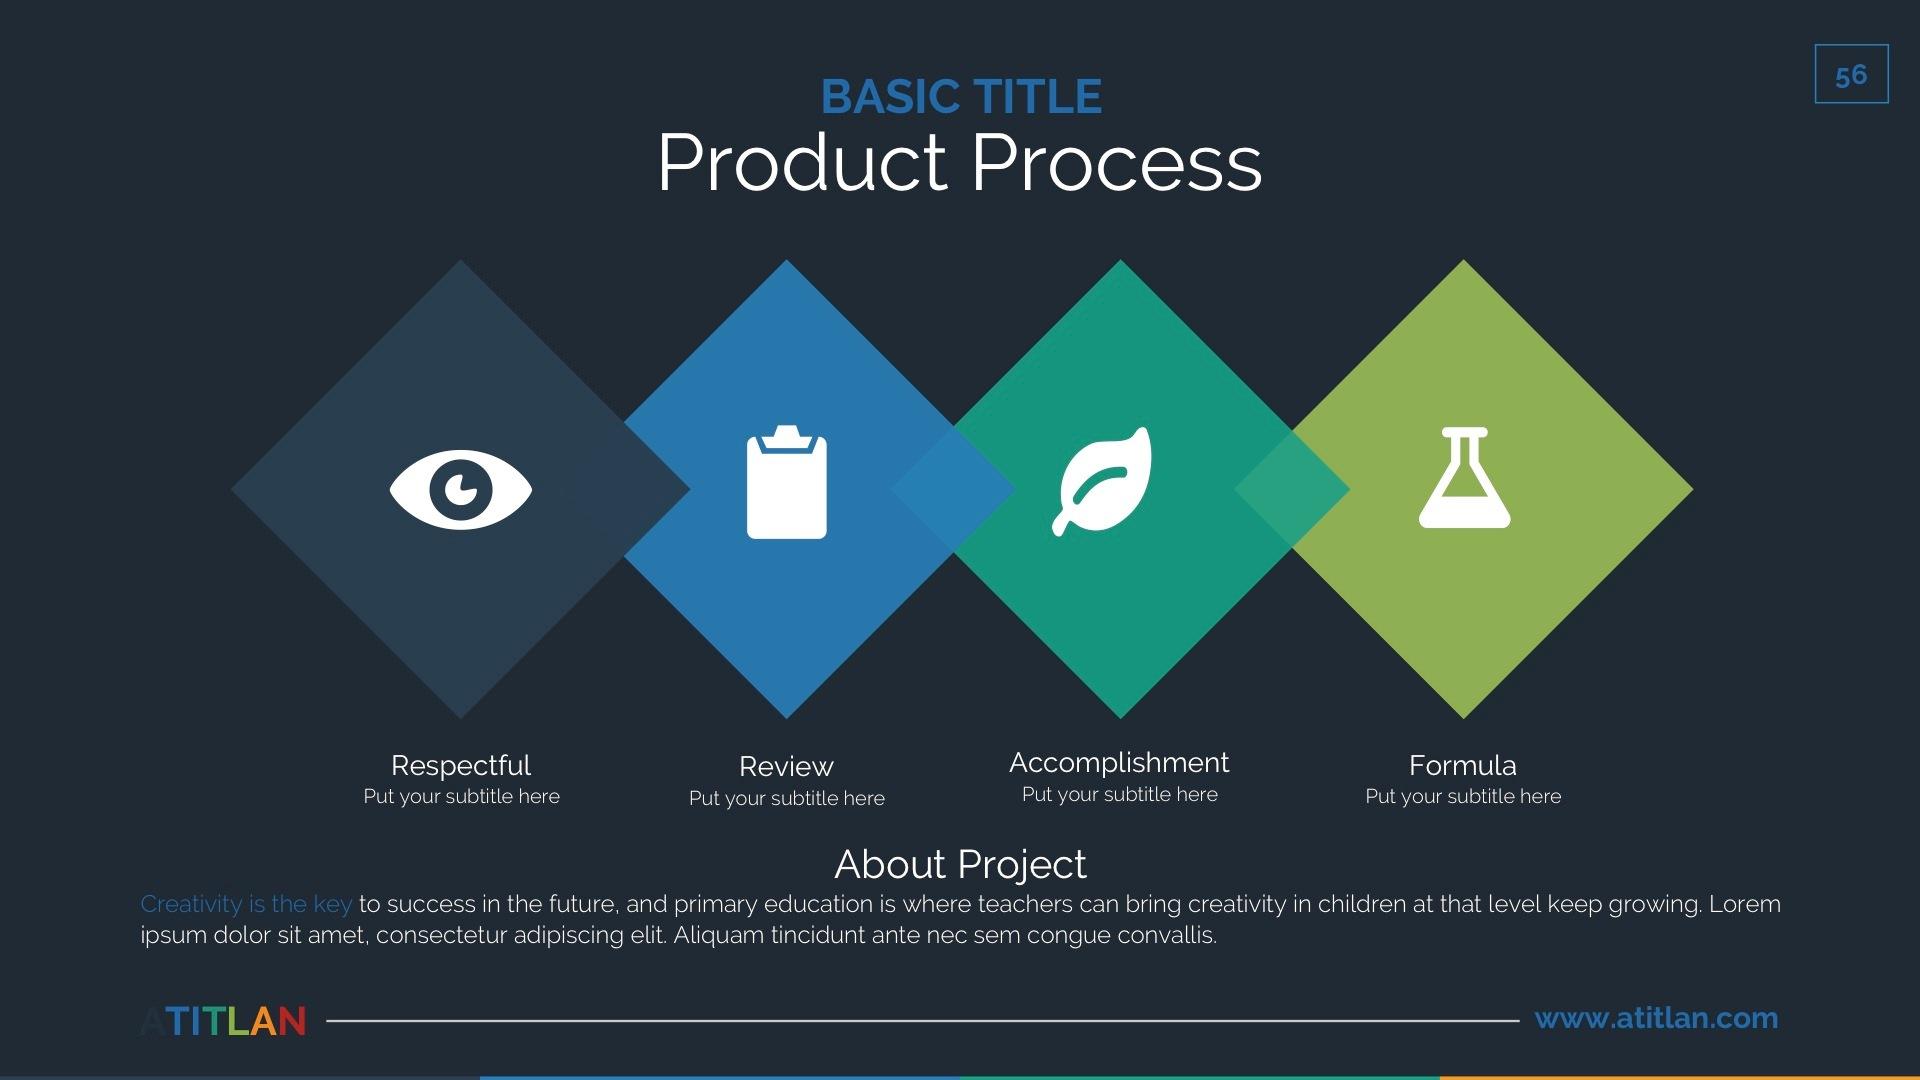 Atitlan PowerPoint Presentation Template rar - In situ